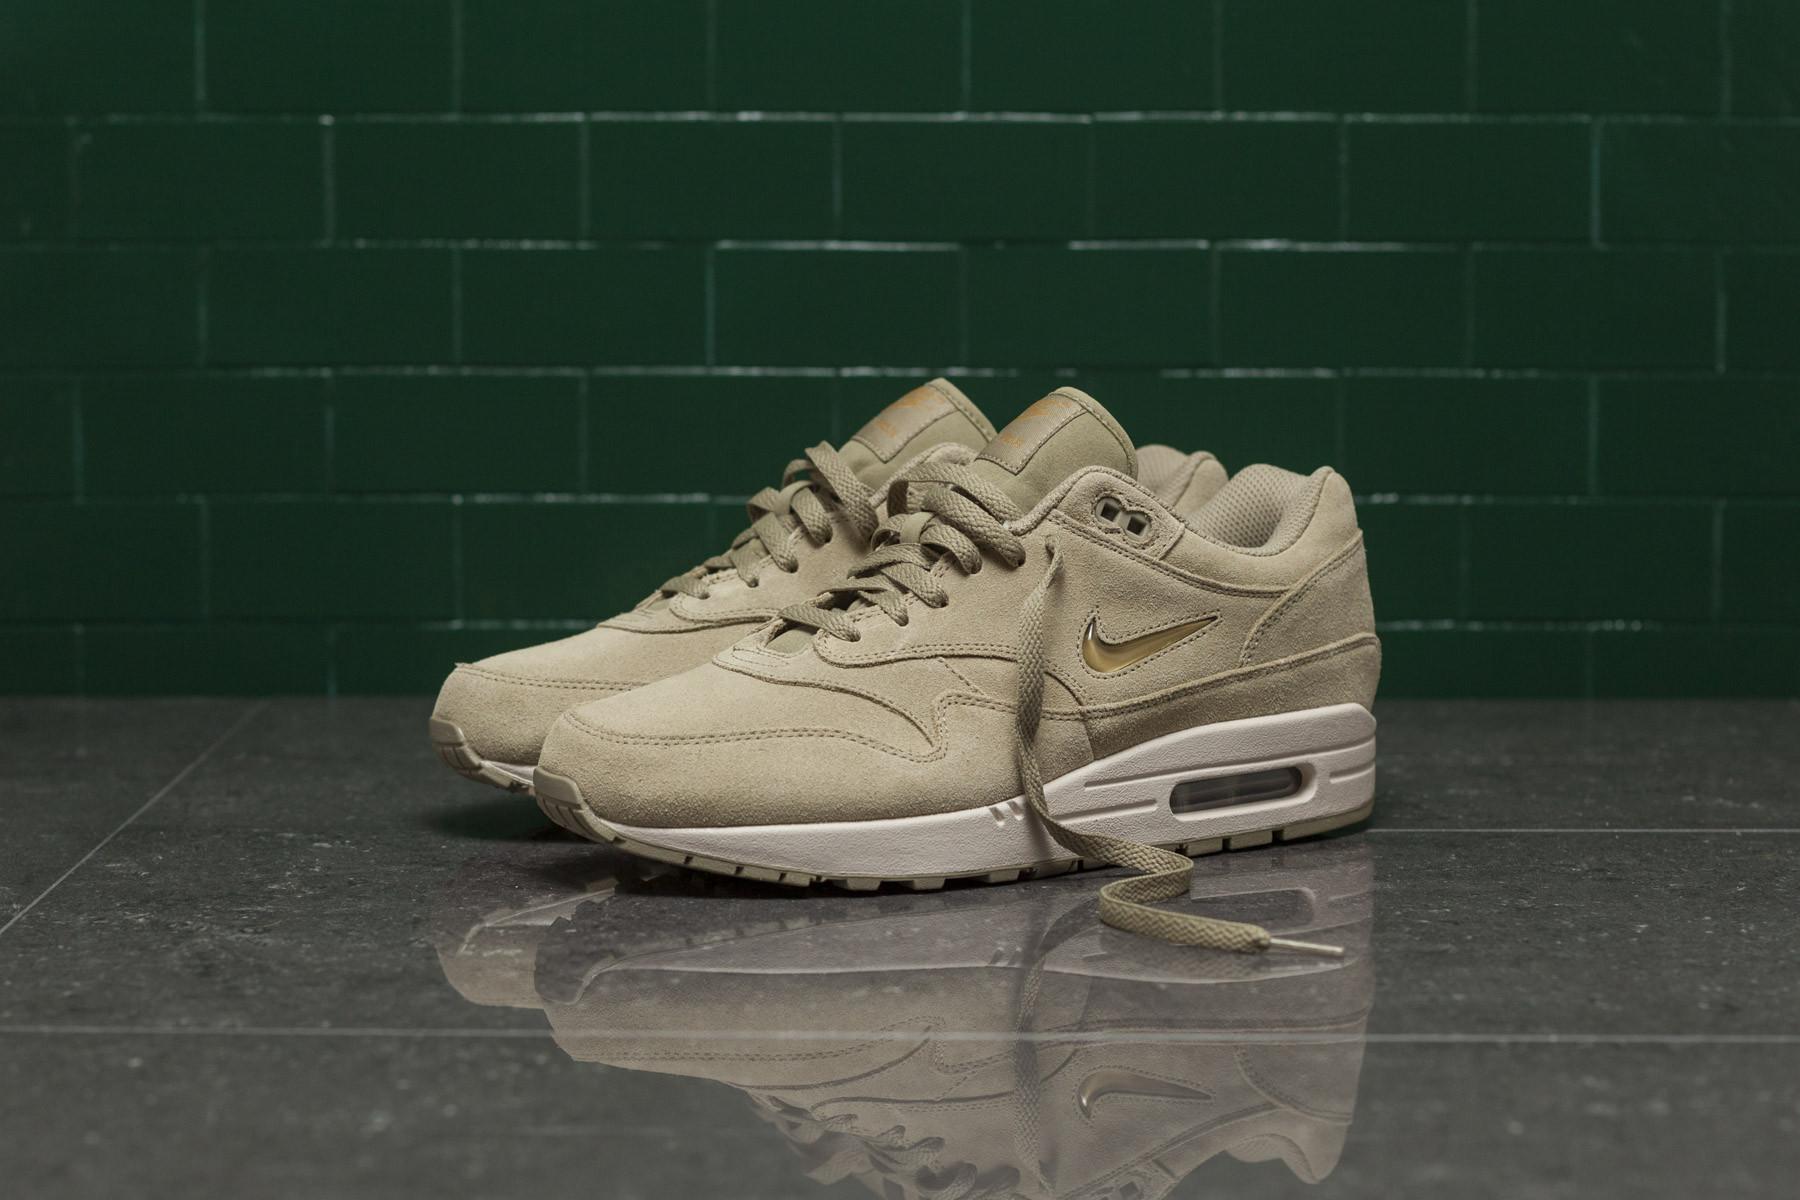 new style ea7c1 e1f6b Nike Air Max 1 PRM SC